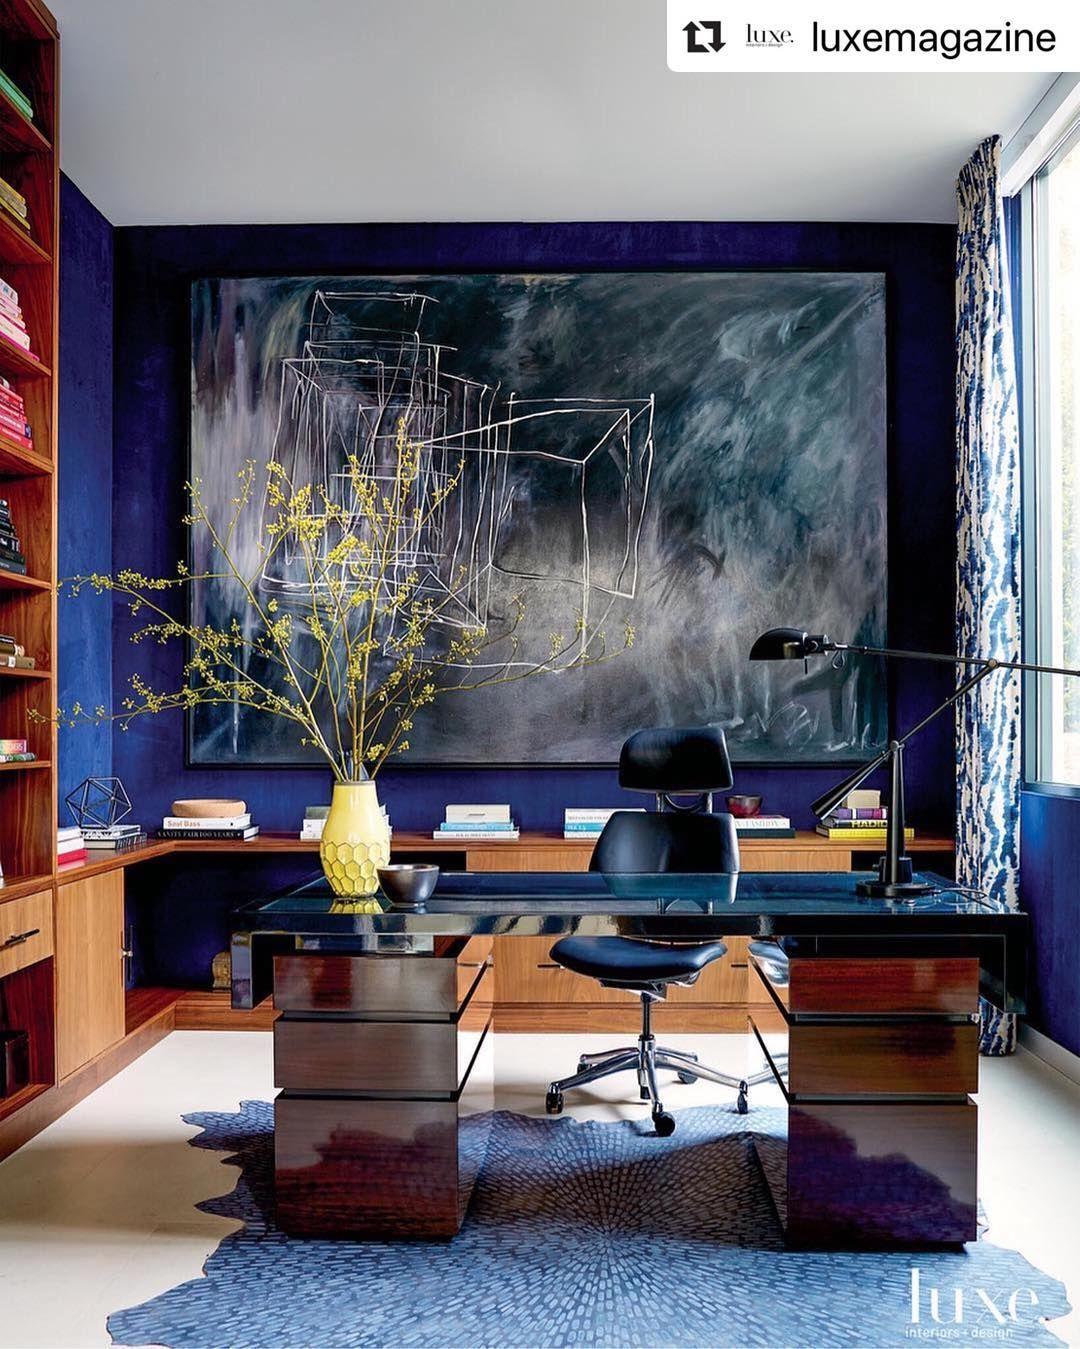 Luxe Interiors Design Luxemagazine Instagram Photos And